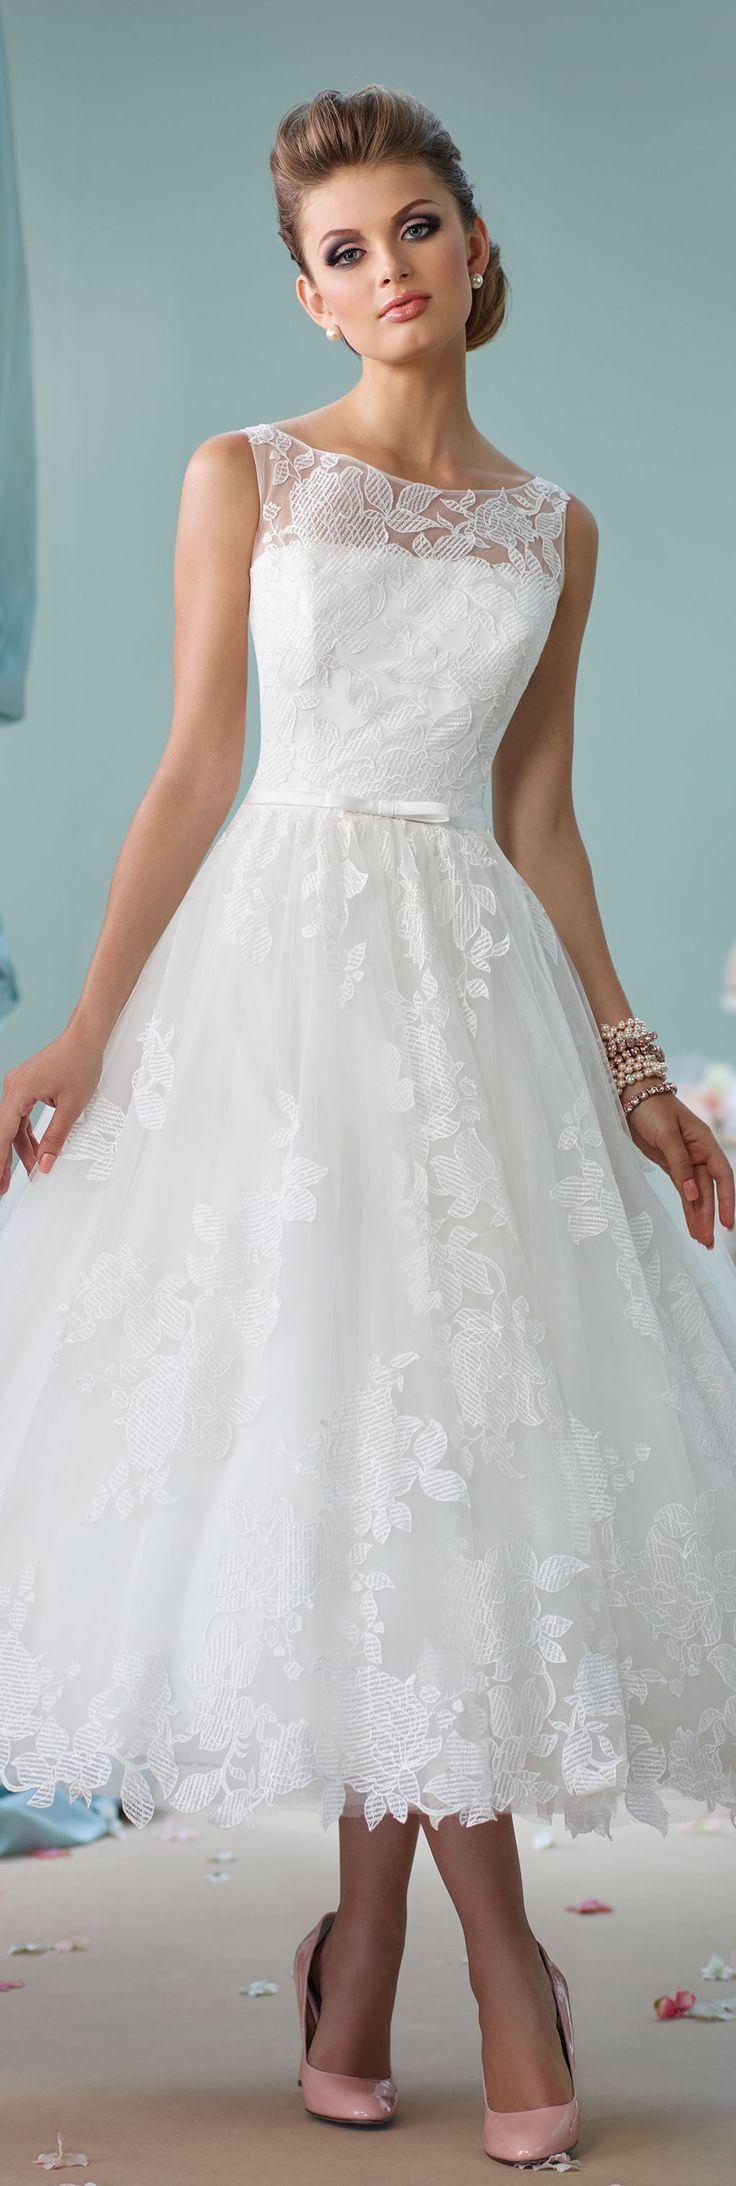 Wedding dresses by mon cheri enchanting spring style no